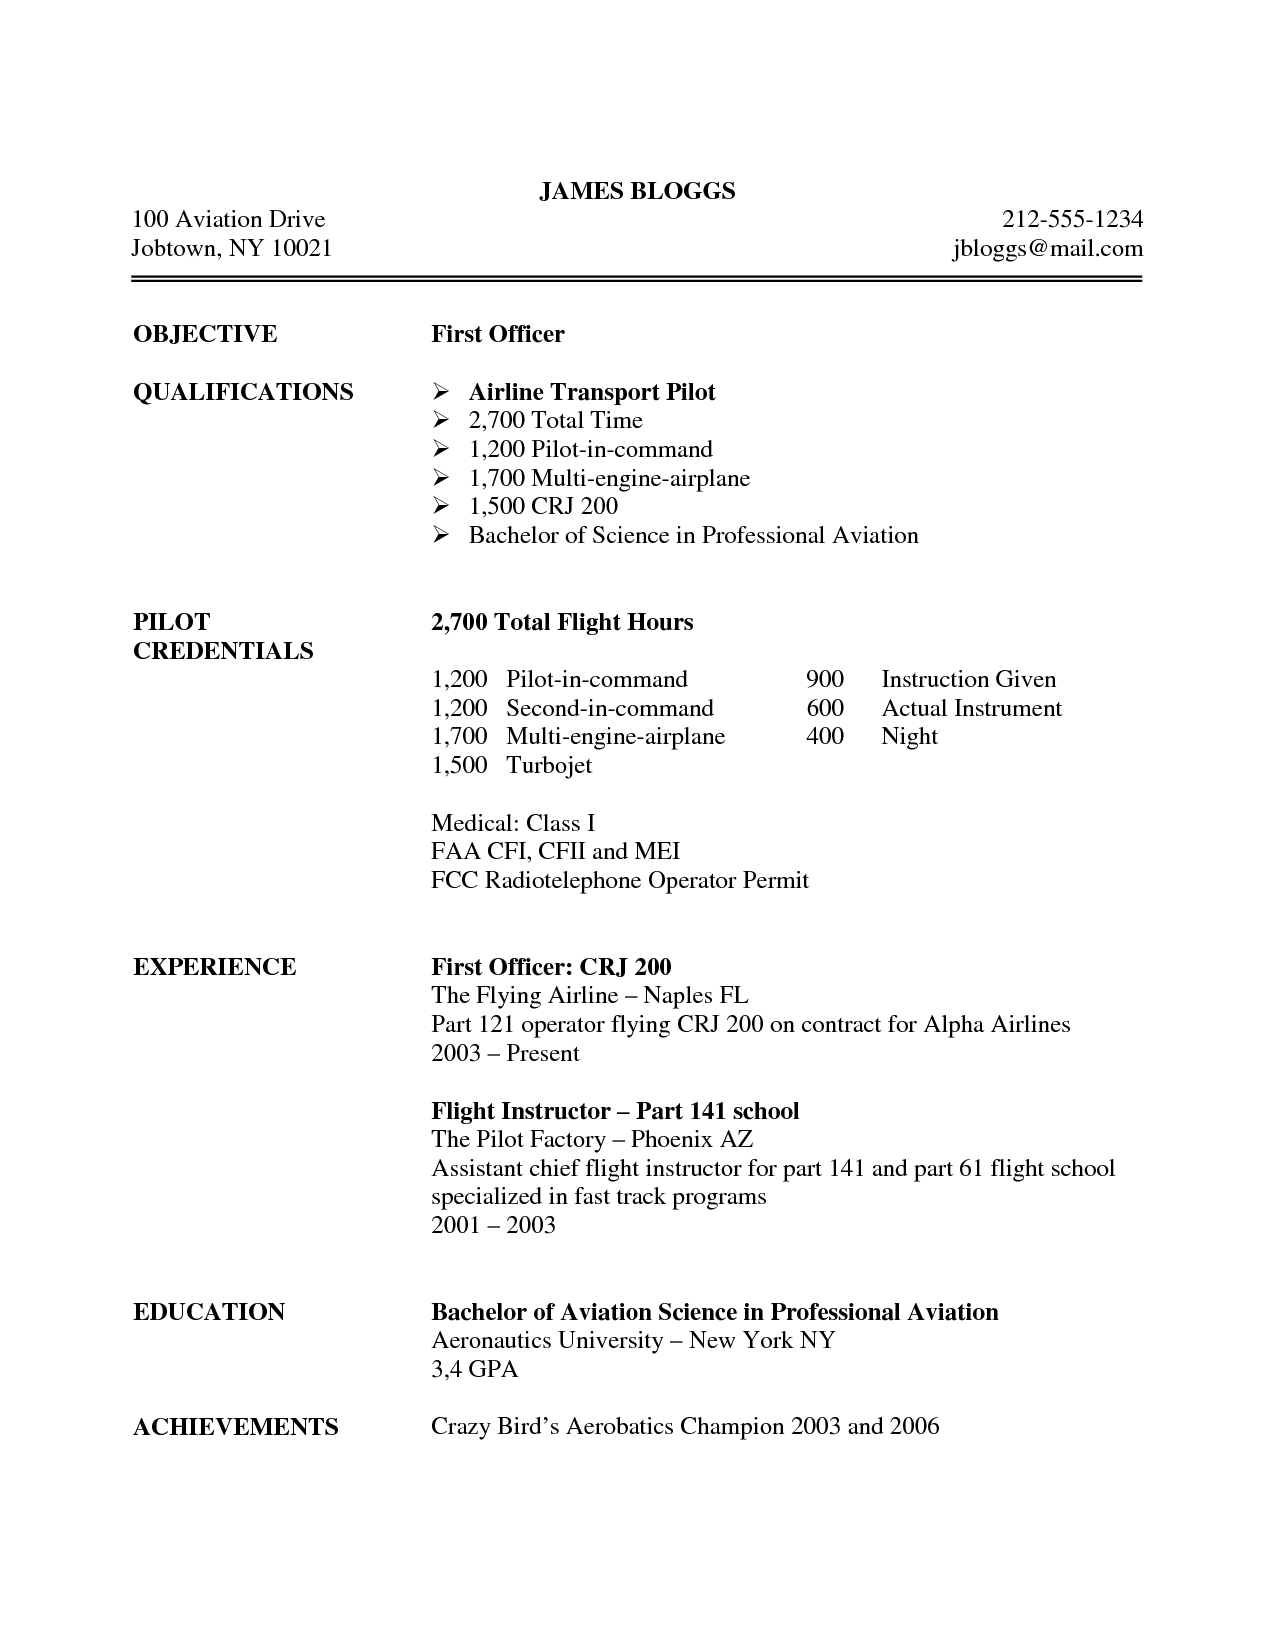 Professional Pilot Resume Professional Pilot Resume Doc Informative Essay Resume Creative Writing Programs